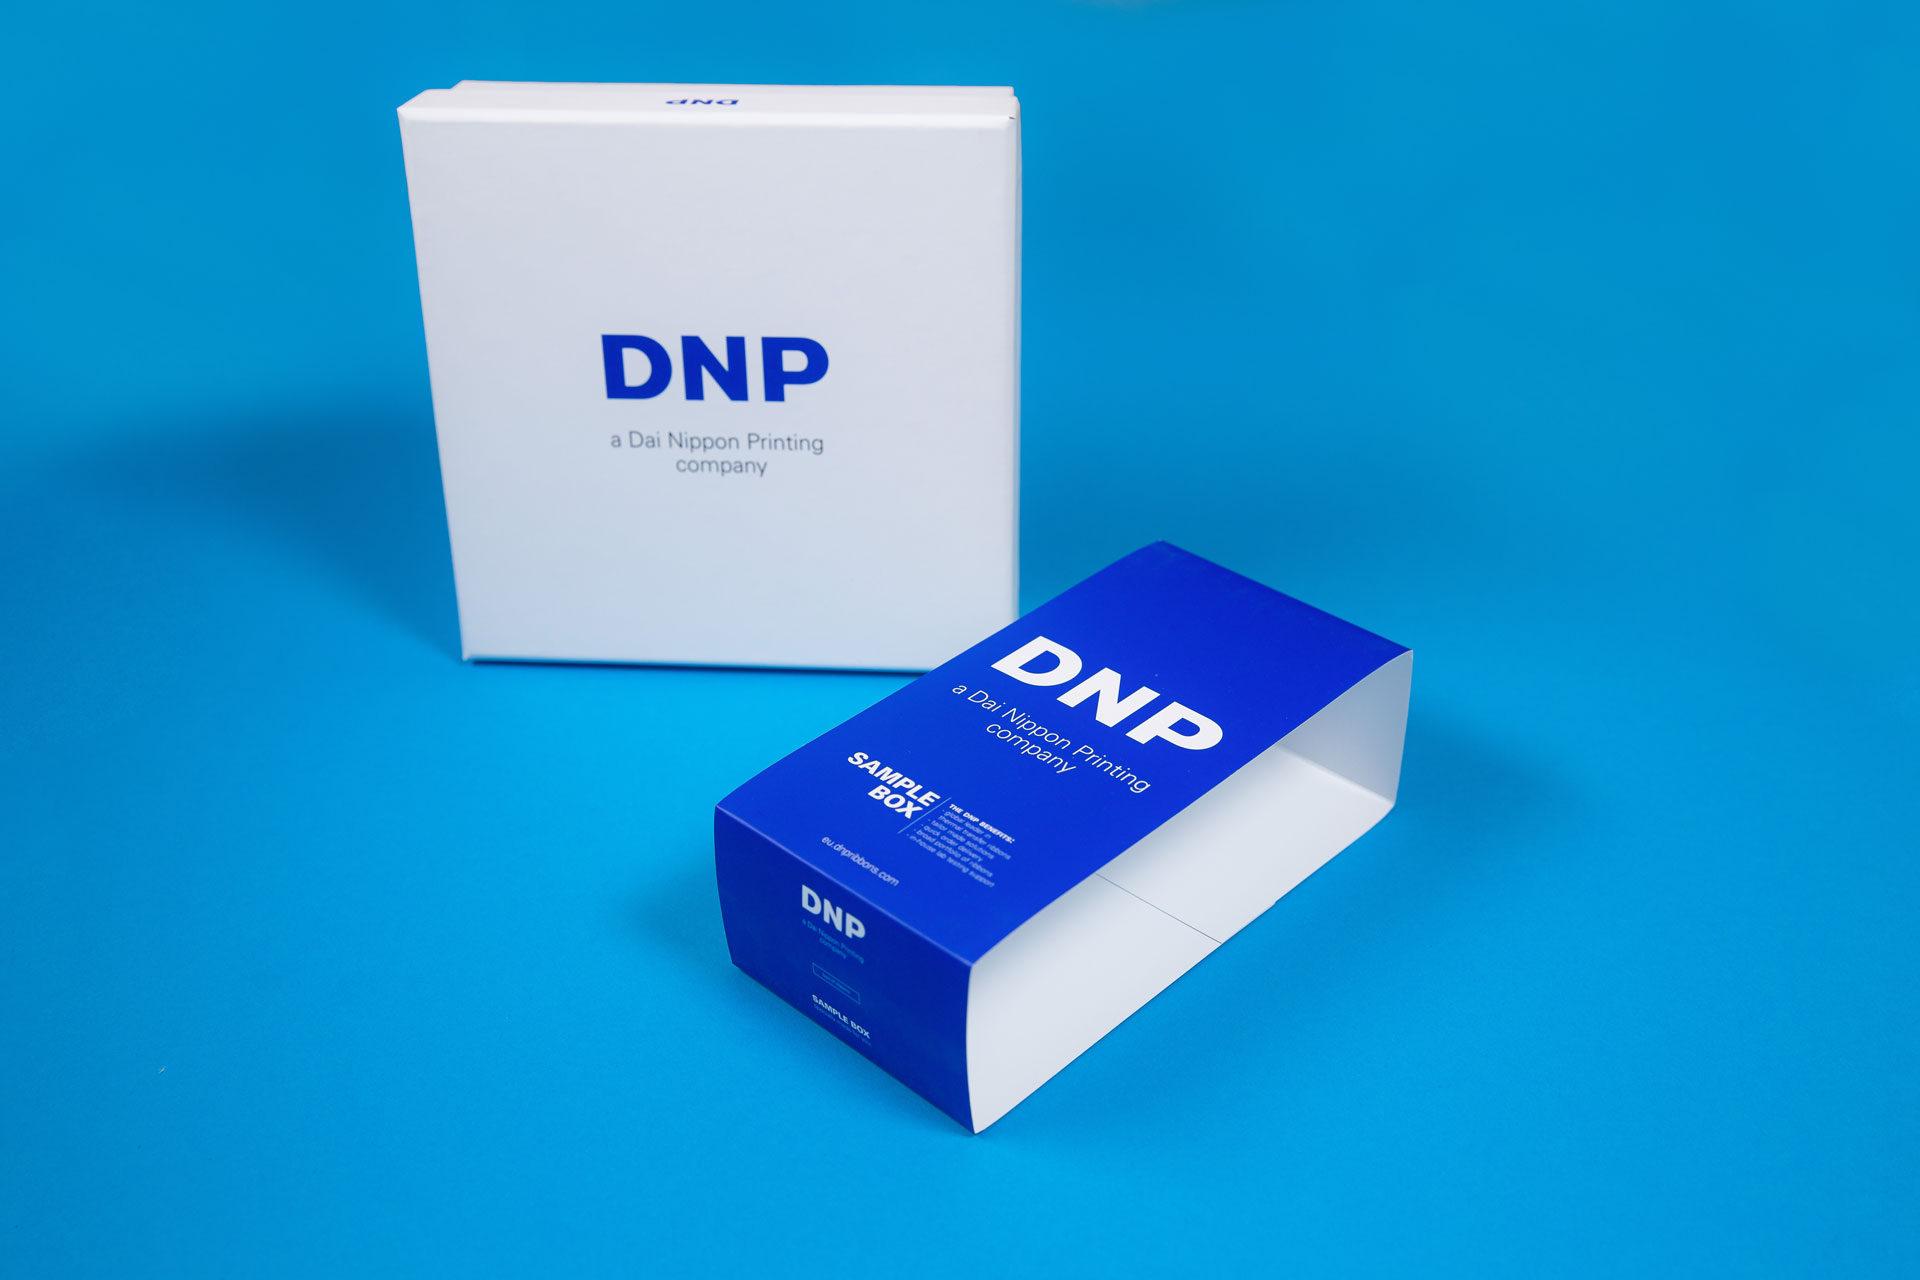 serie doosjes met deksels DNP